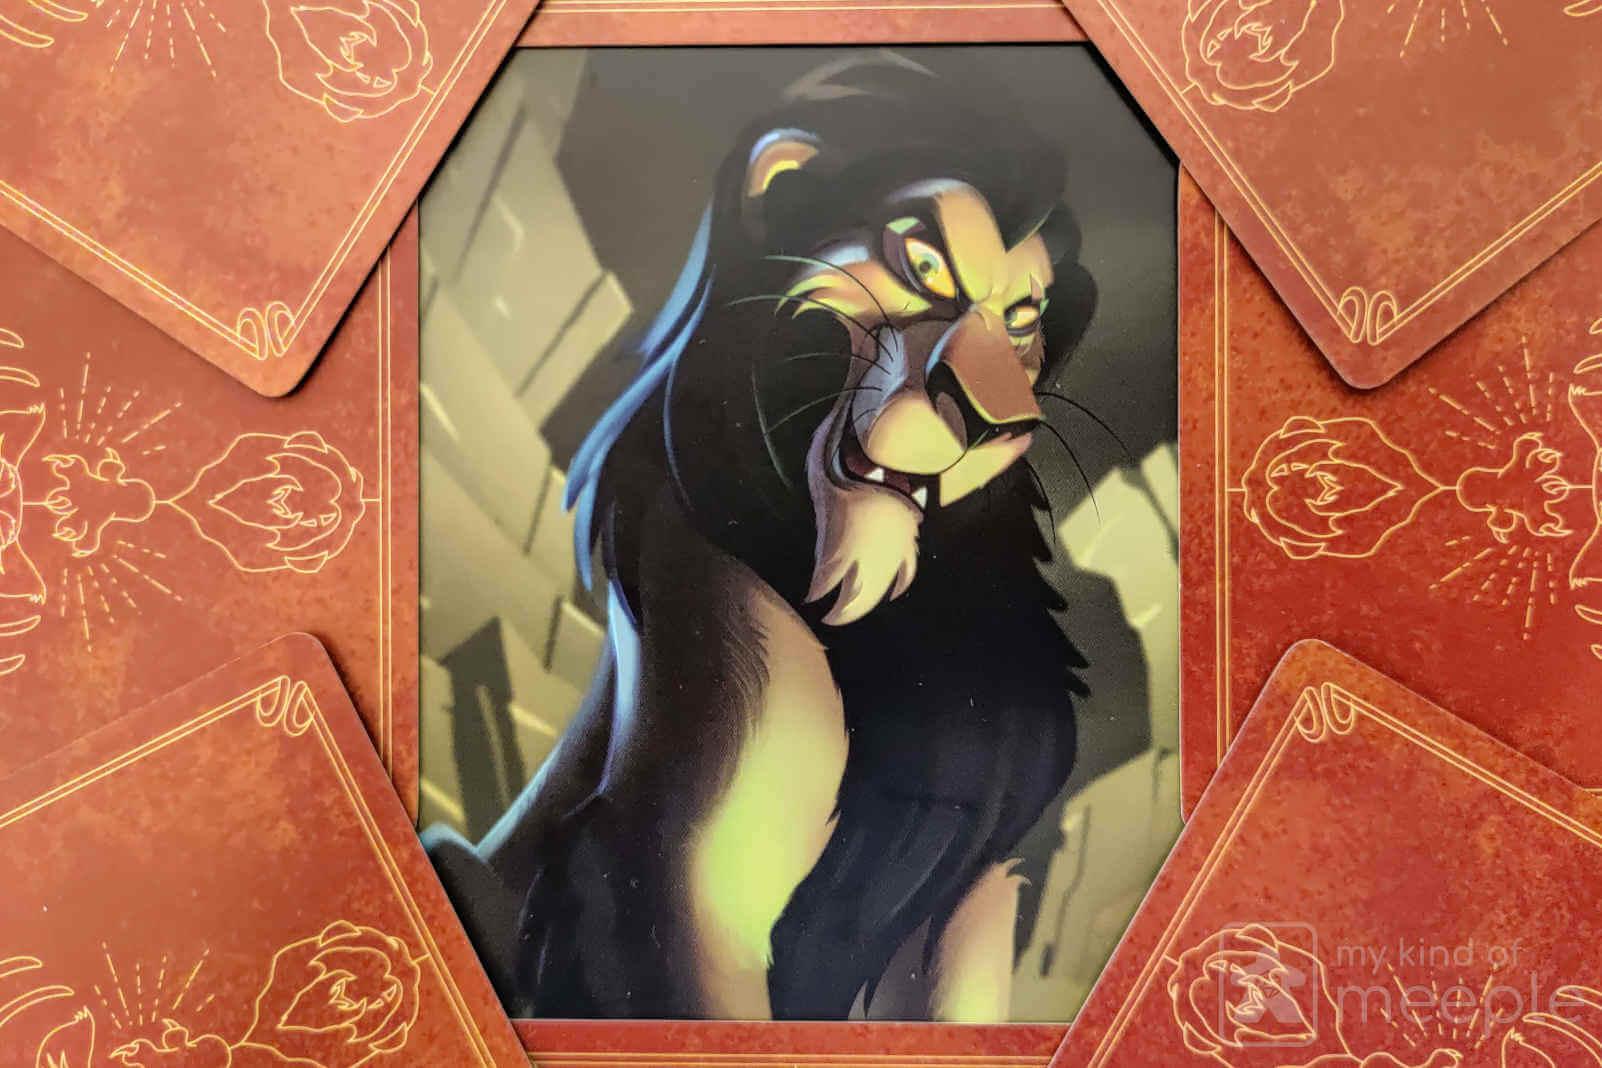 Scar Disney Villainous